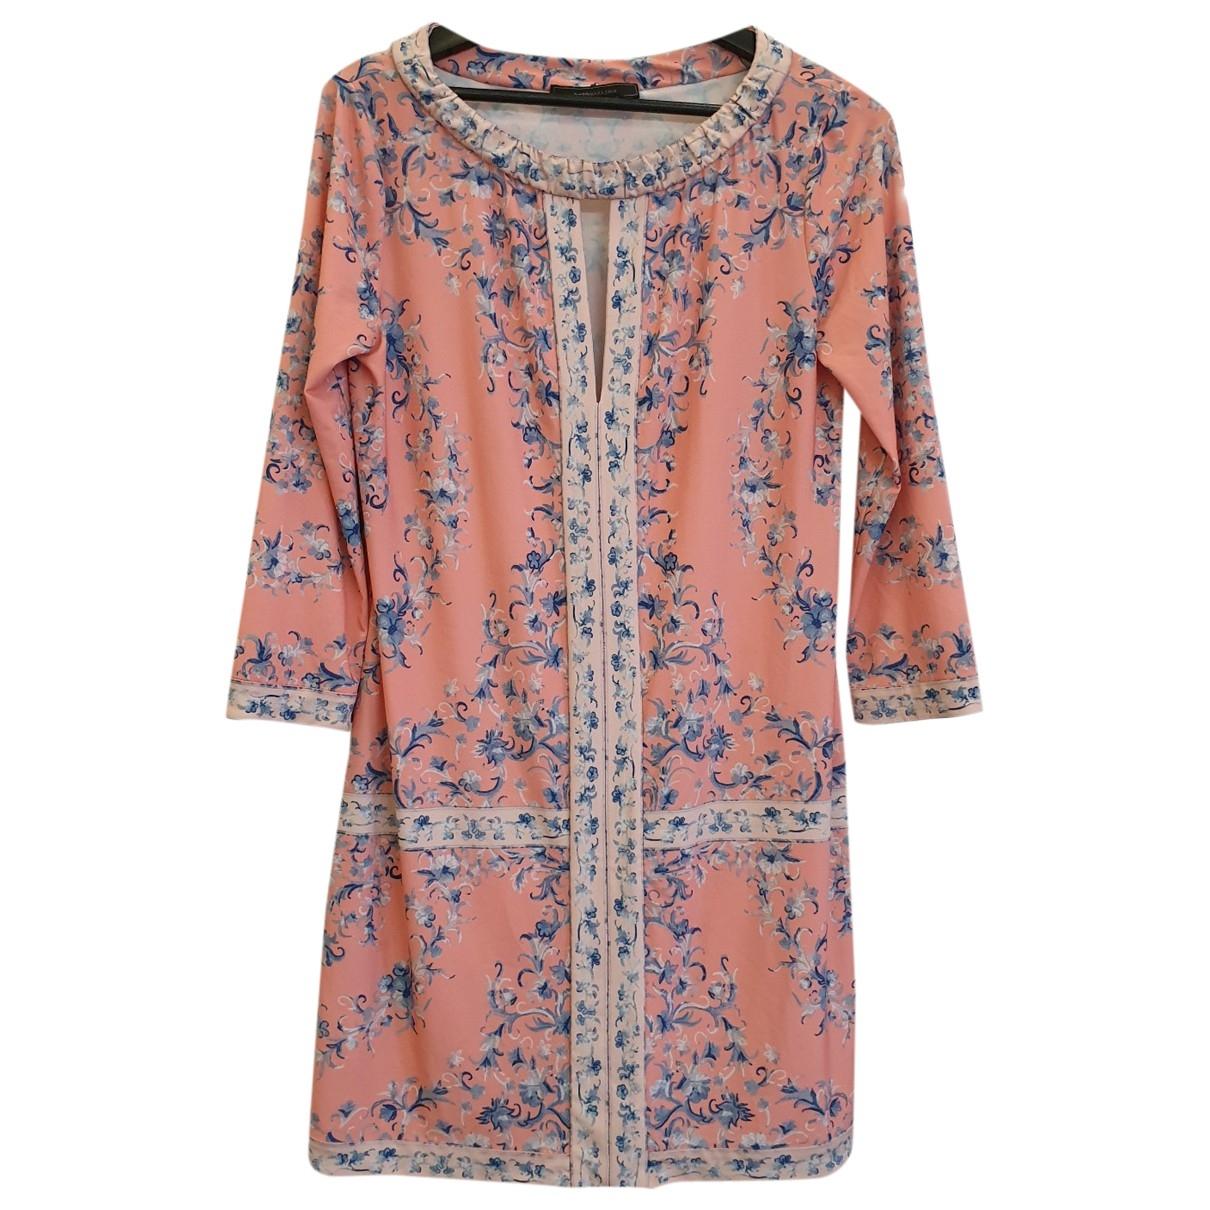 Bcbg Max Azria \N Pink dress for Women 38 FR